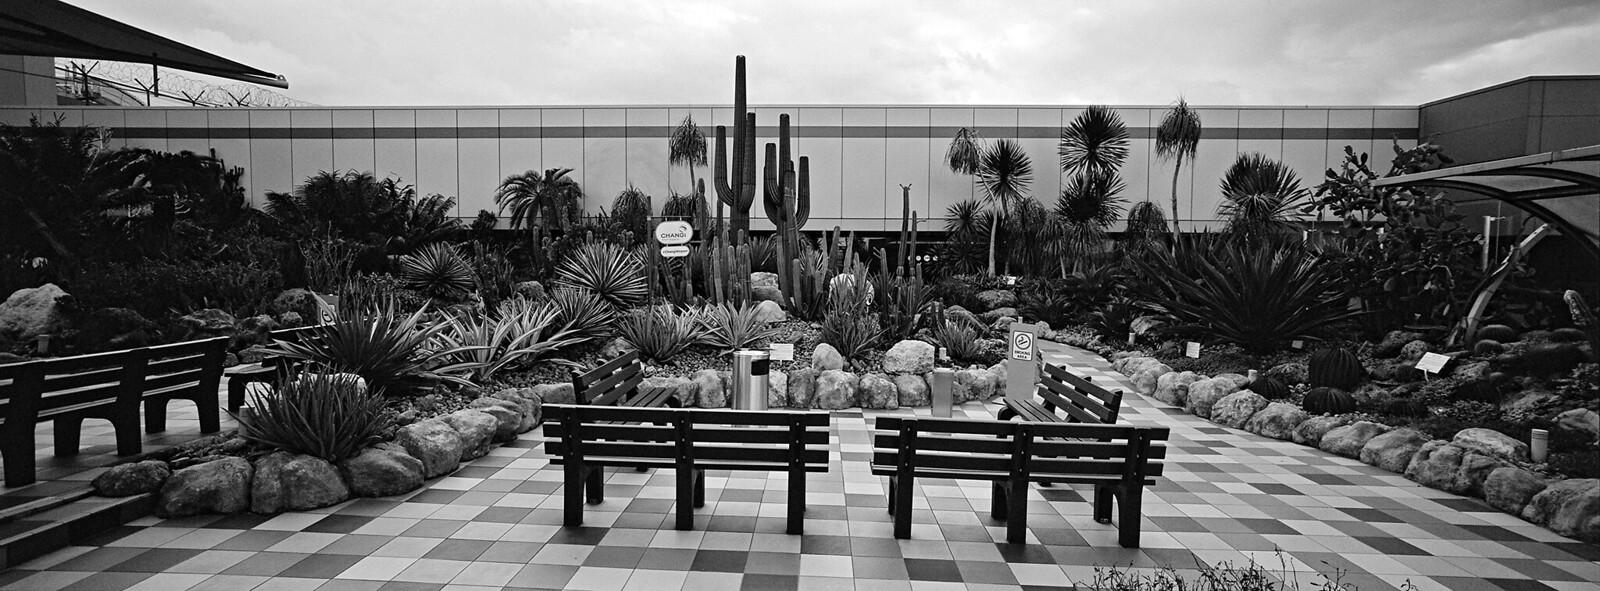 Changi Airport Cactus Garden i